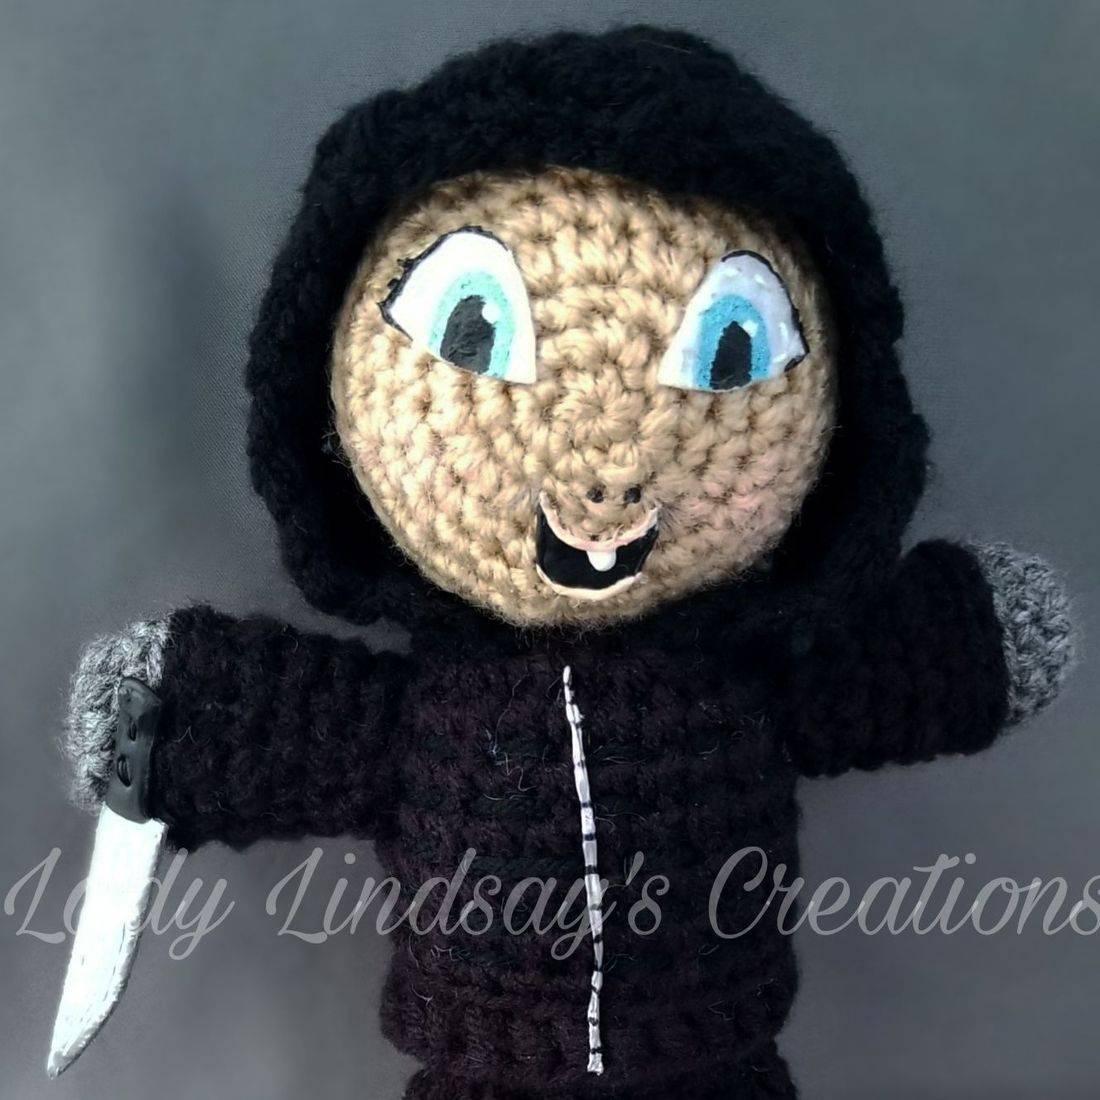 Happy Death Day, Commission, Custom, Crochet, Amigurumi, Plush, Doll, Handmade, handcrafted, craft, artisan, art, paint, Shop Small, Villain